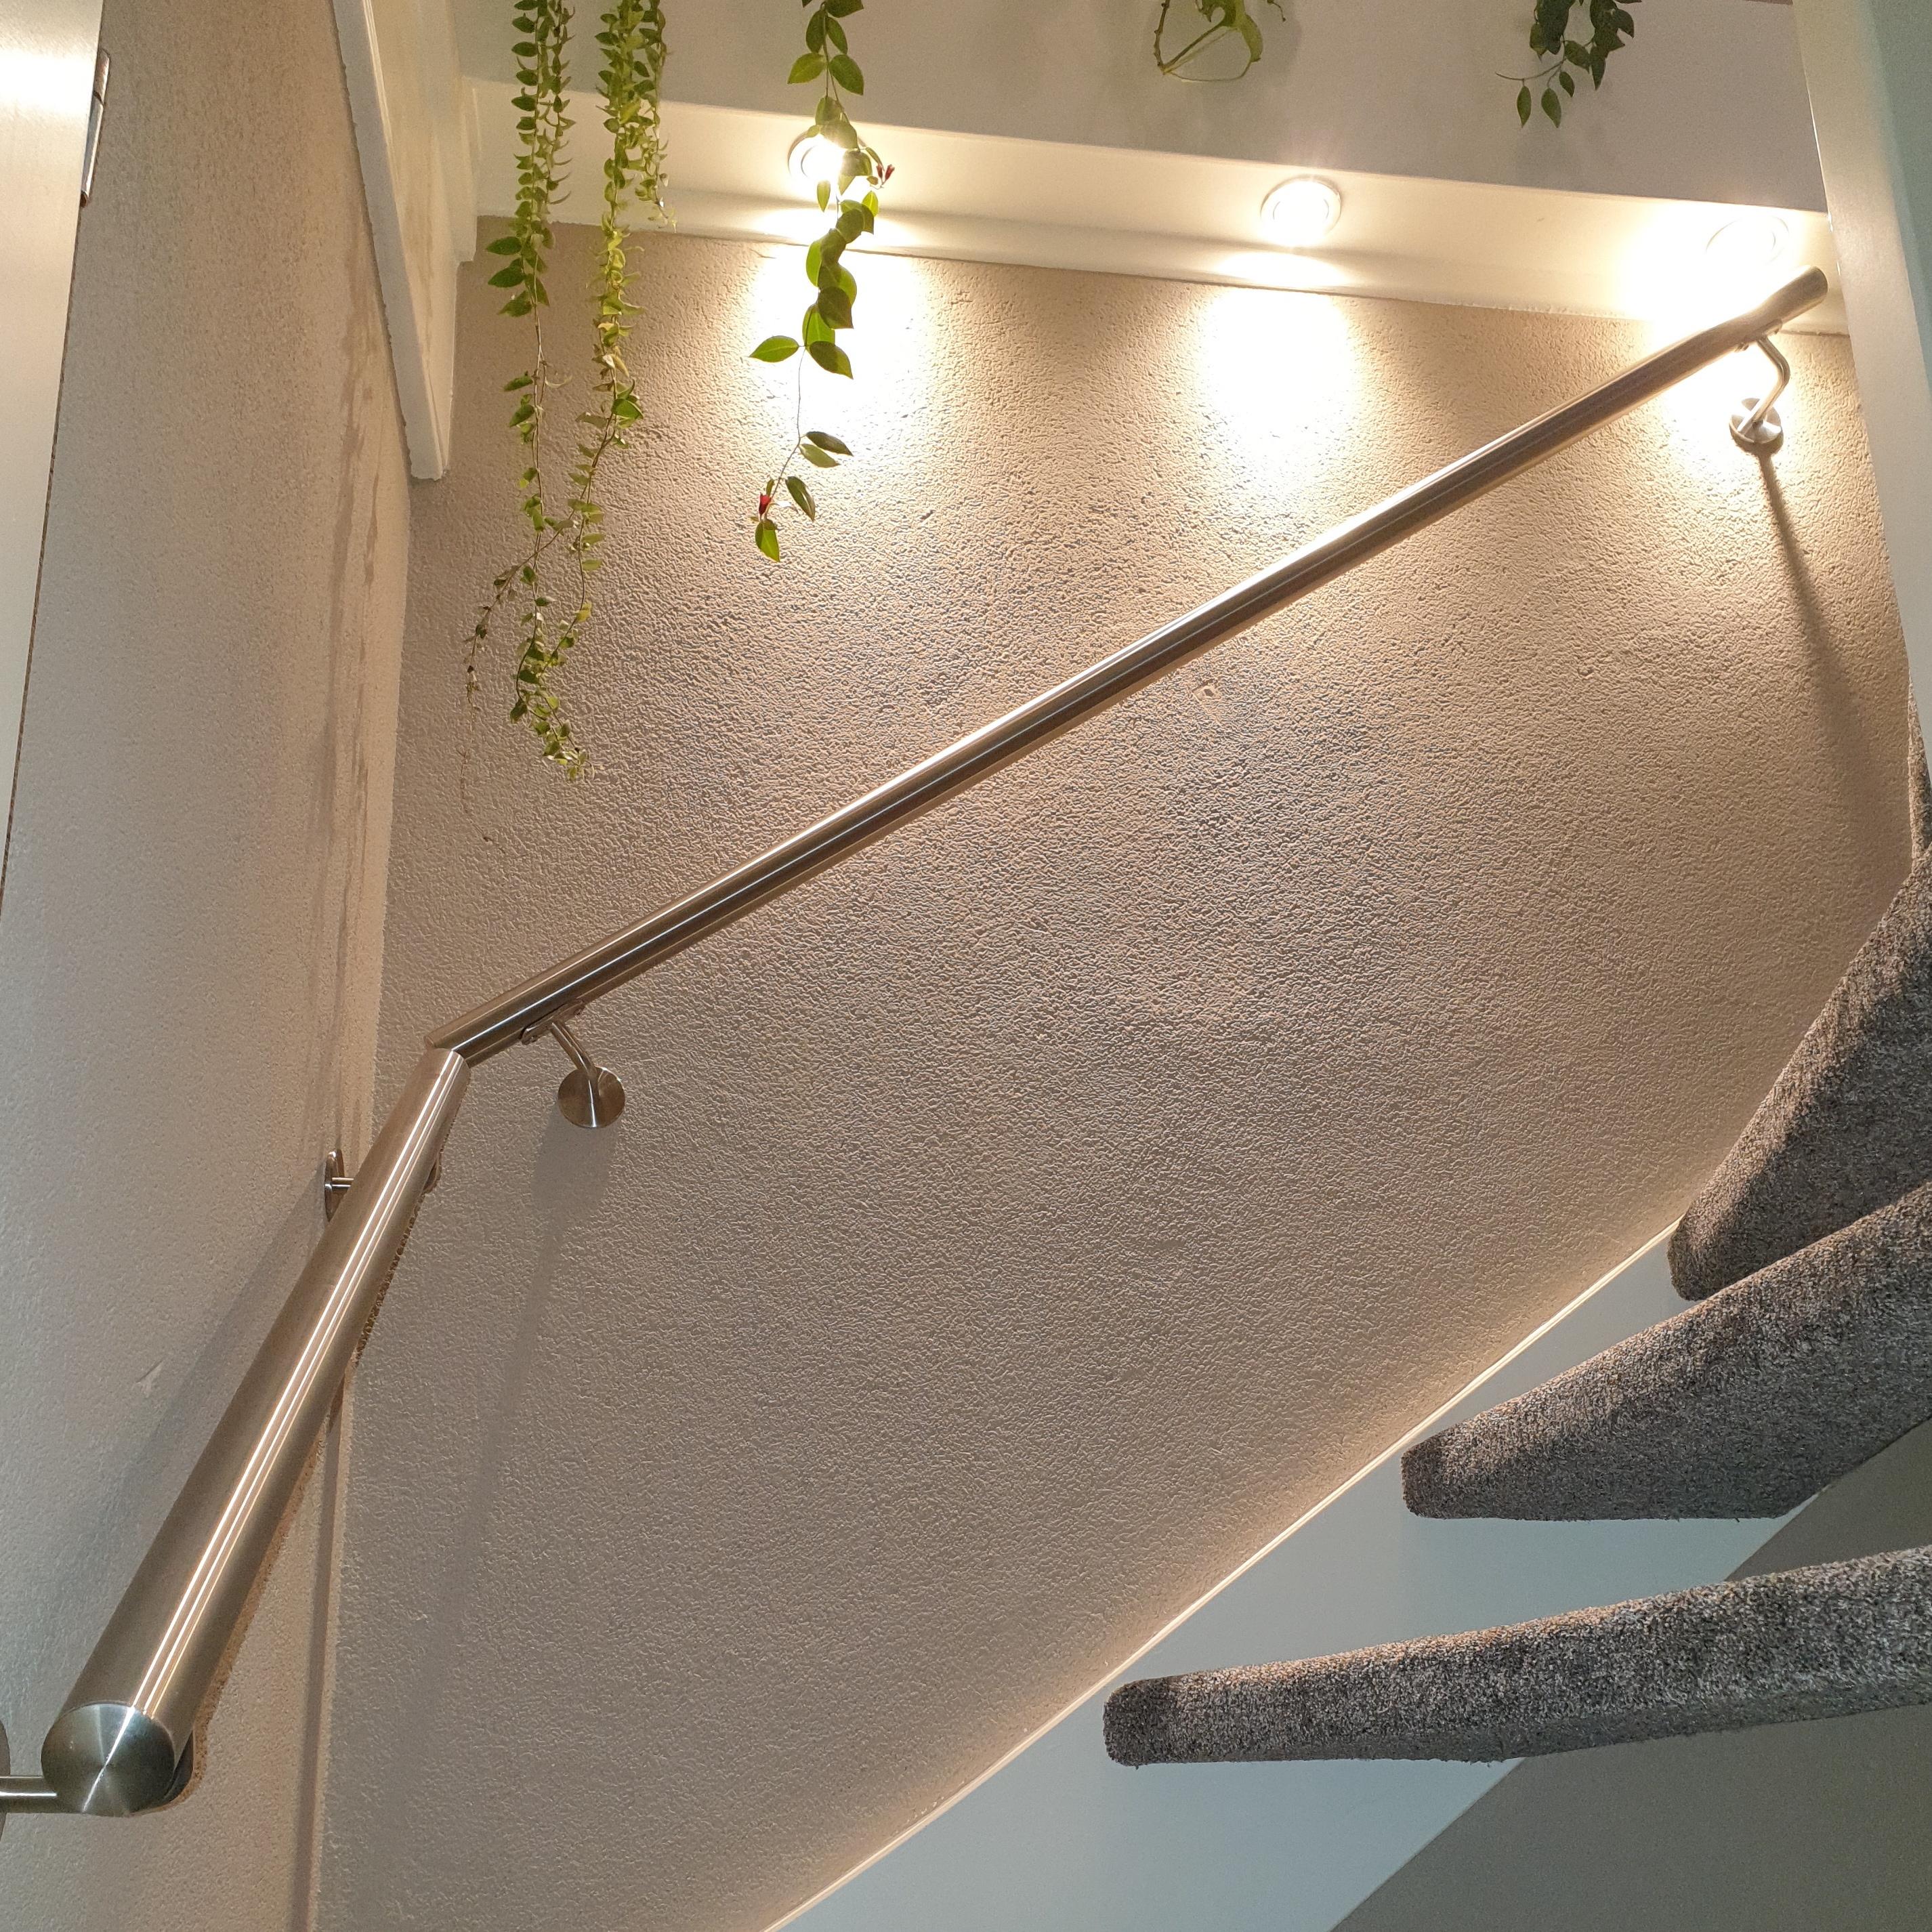 Handlauf Edelstahl rund gebürstet Modell 3 - Runde Edelstahl Treppengeländer - Treppenhandlauf